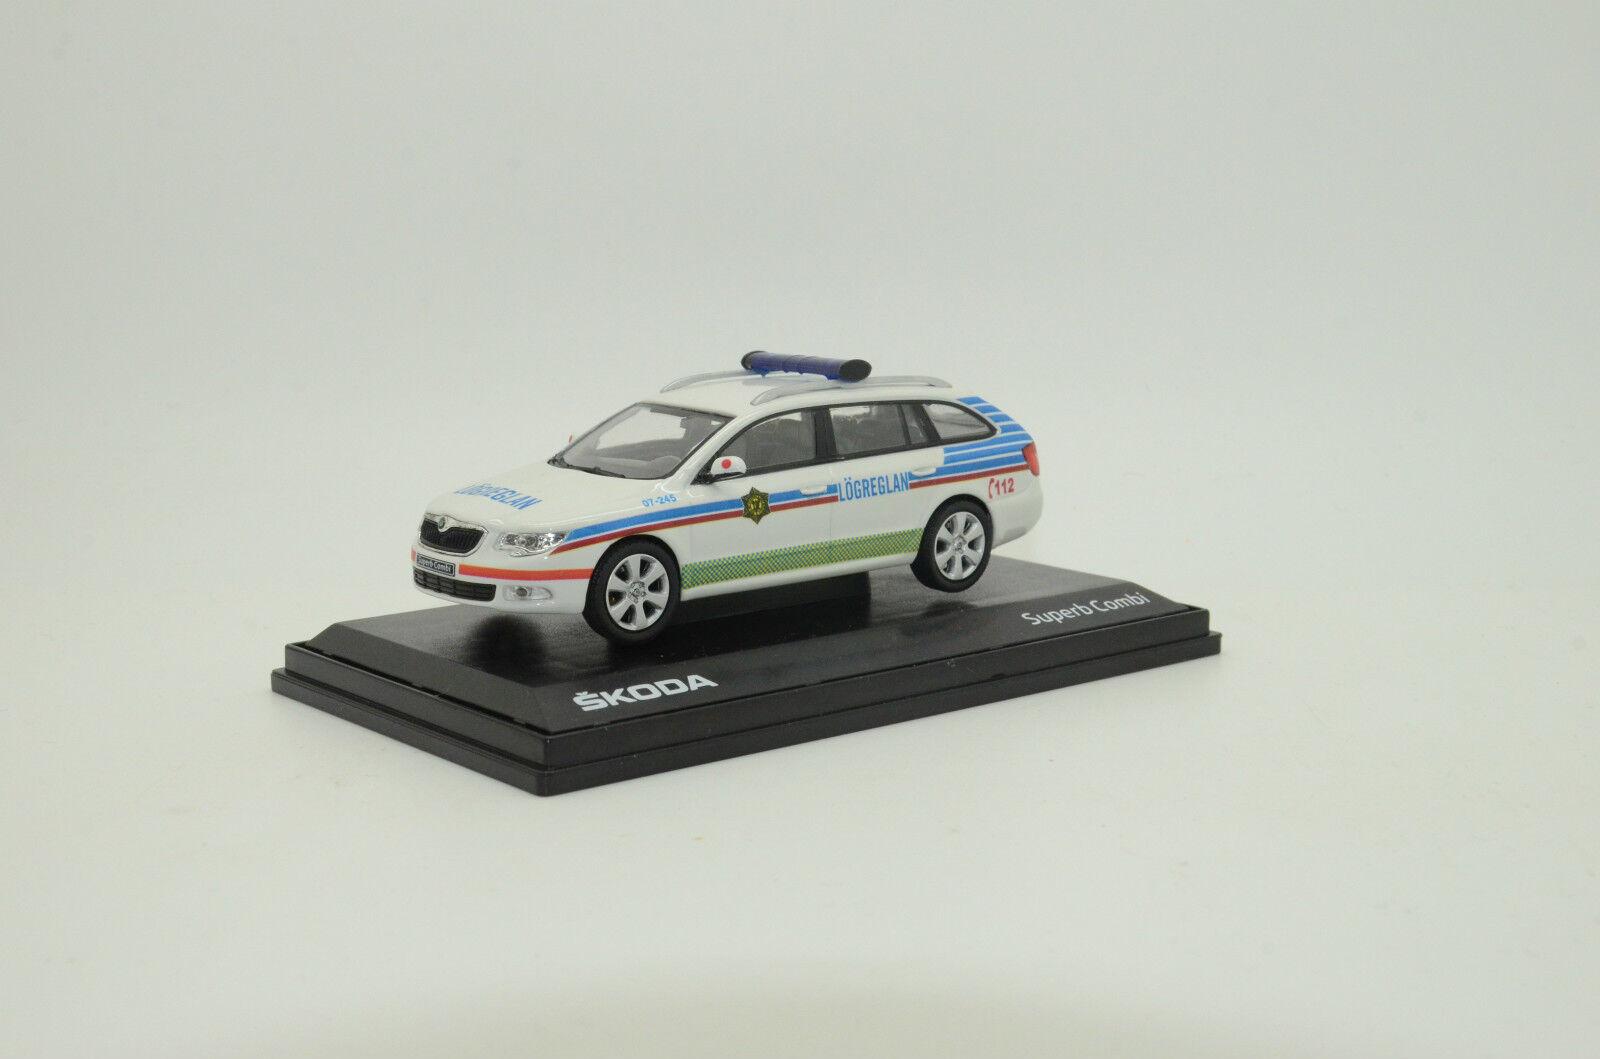 rara    Skoda súperb islandés policía Hecho a Medida 1 43